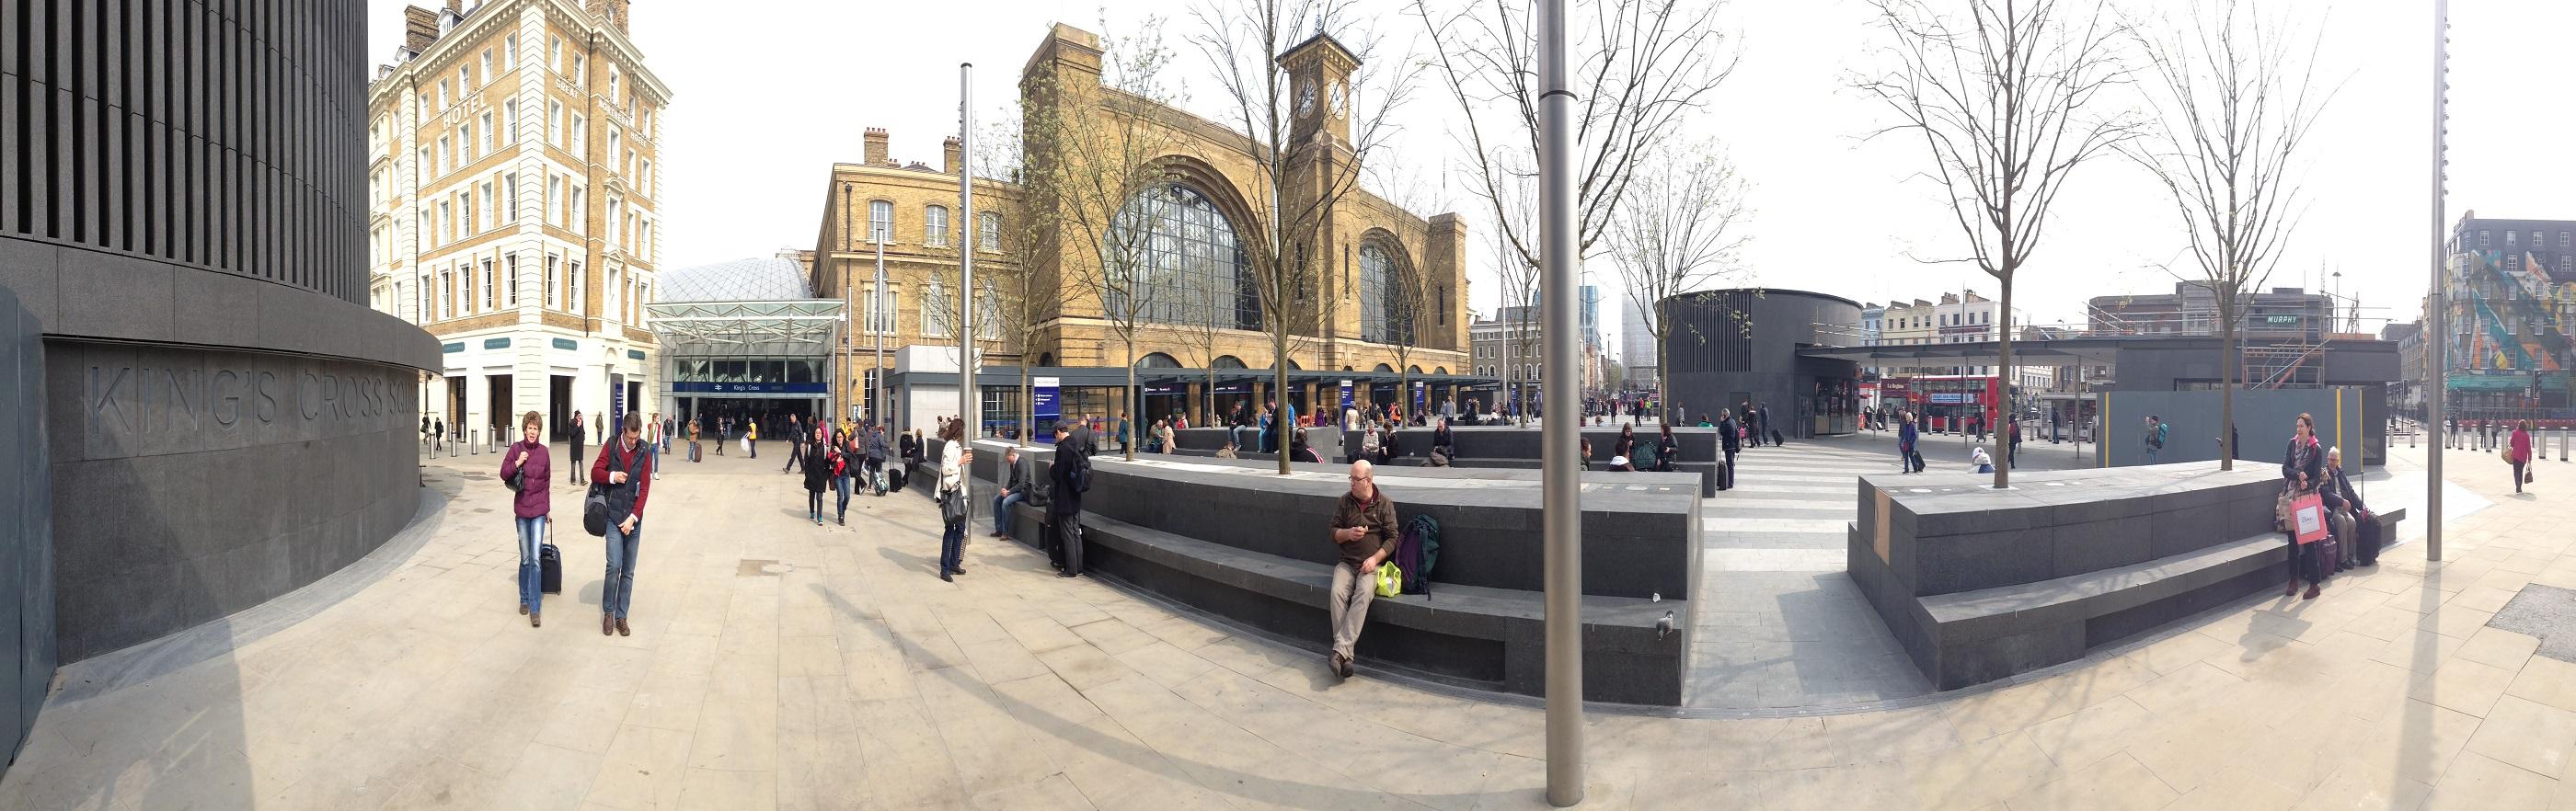 Kings Cross Square